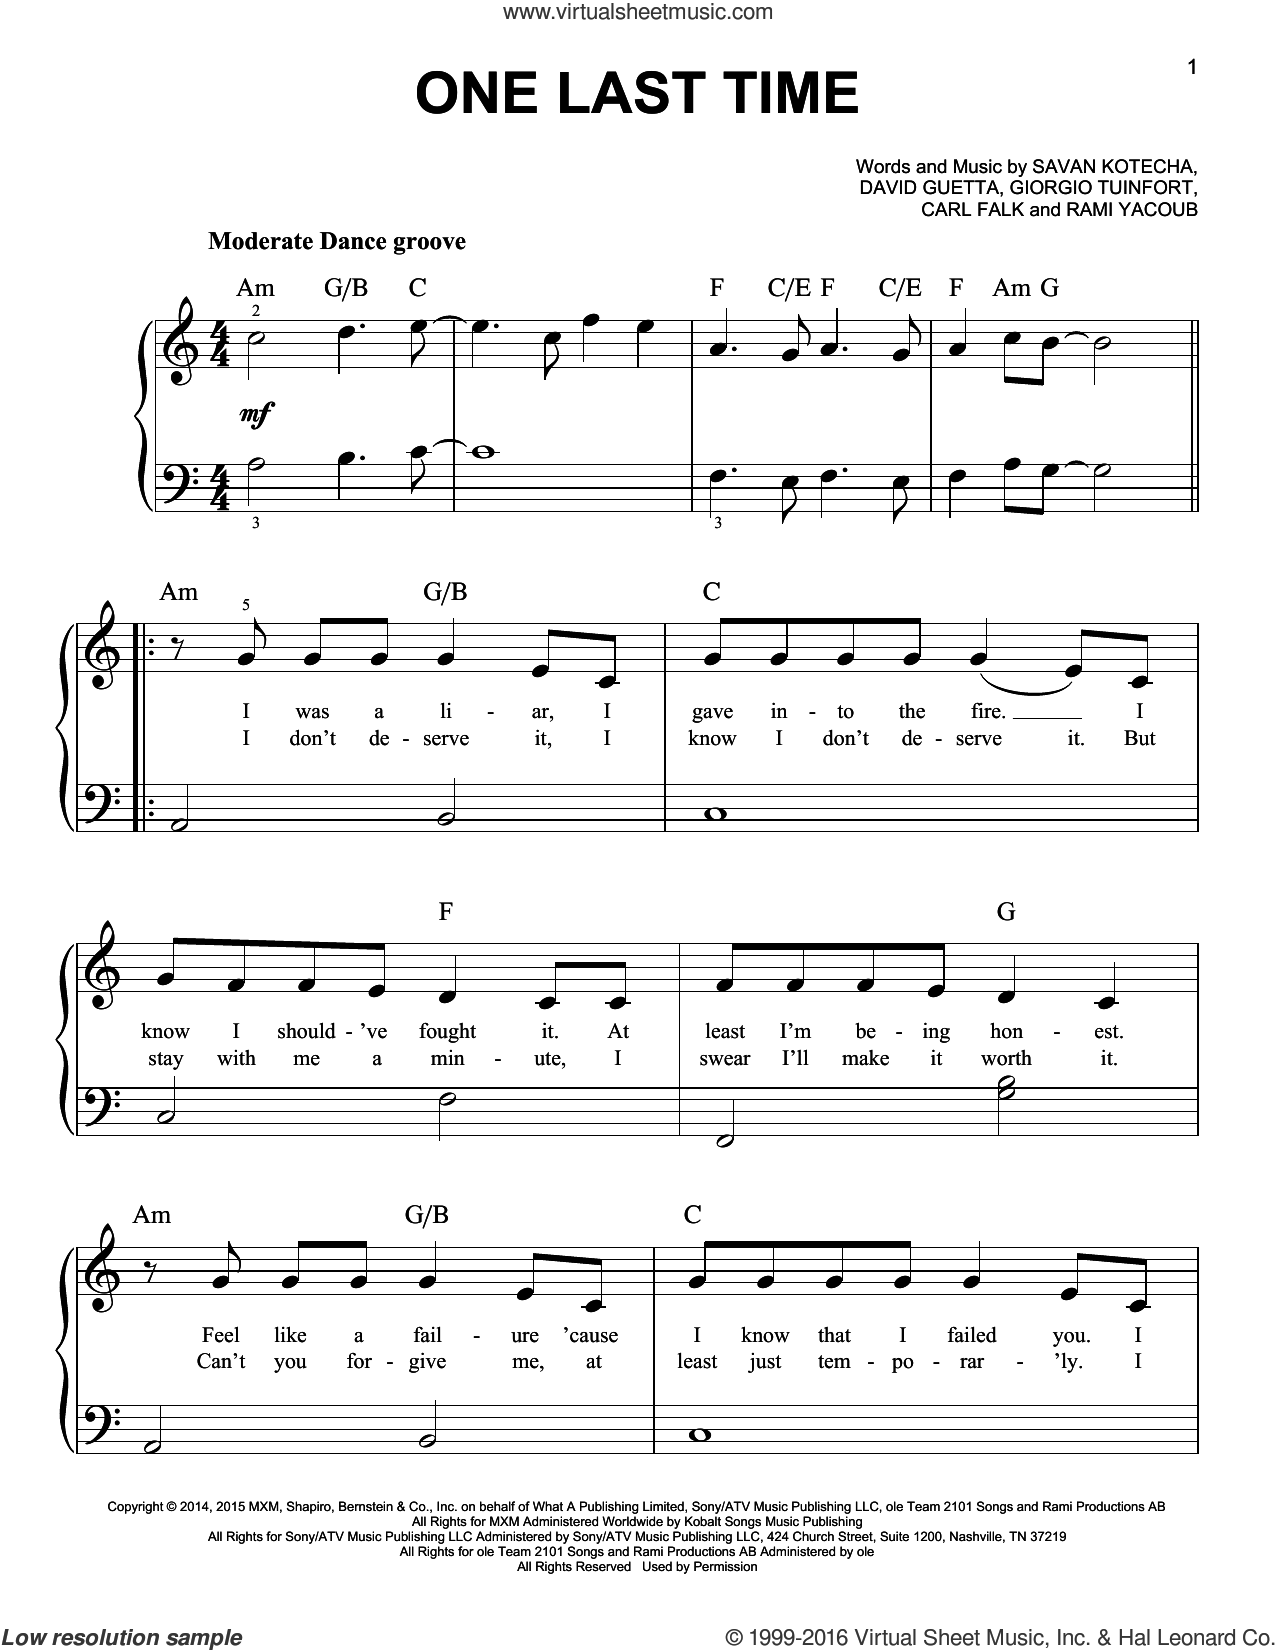 Grande One Last Time Sheet Music For Piano Solo Pdf